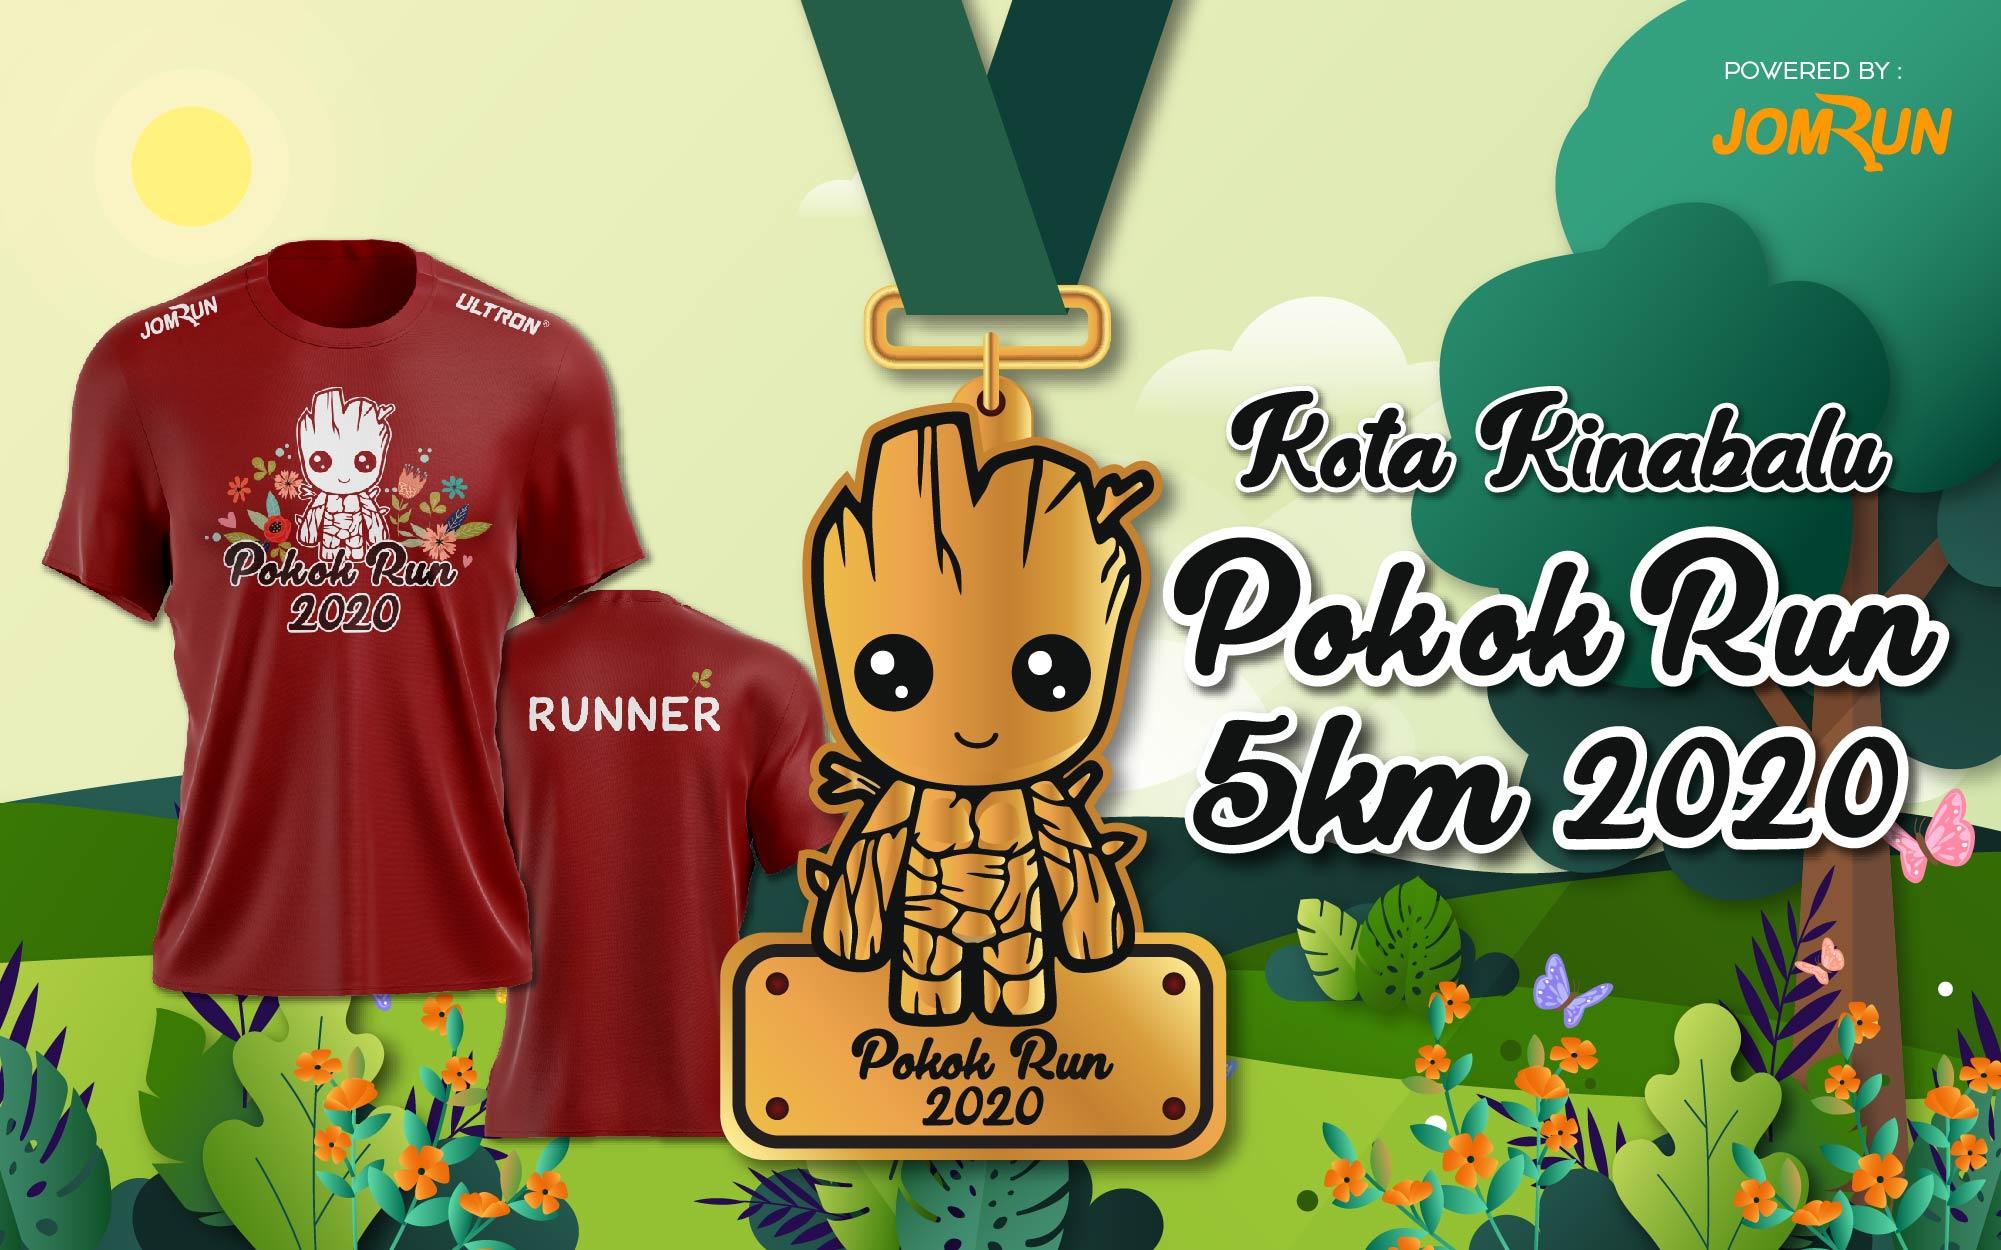 Kota Kinabalu Pokok Run 5KM 2020 (Event cancelled)